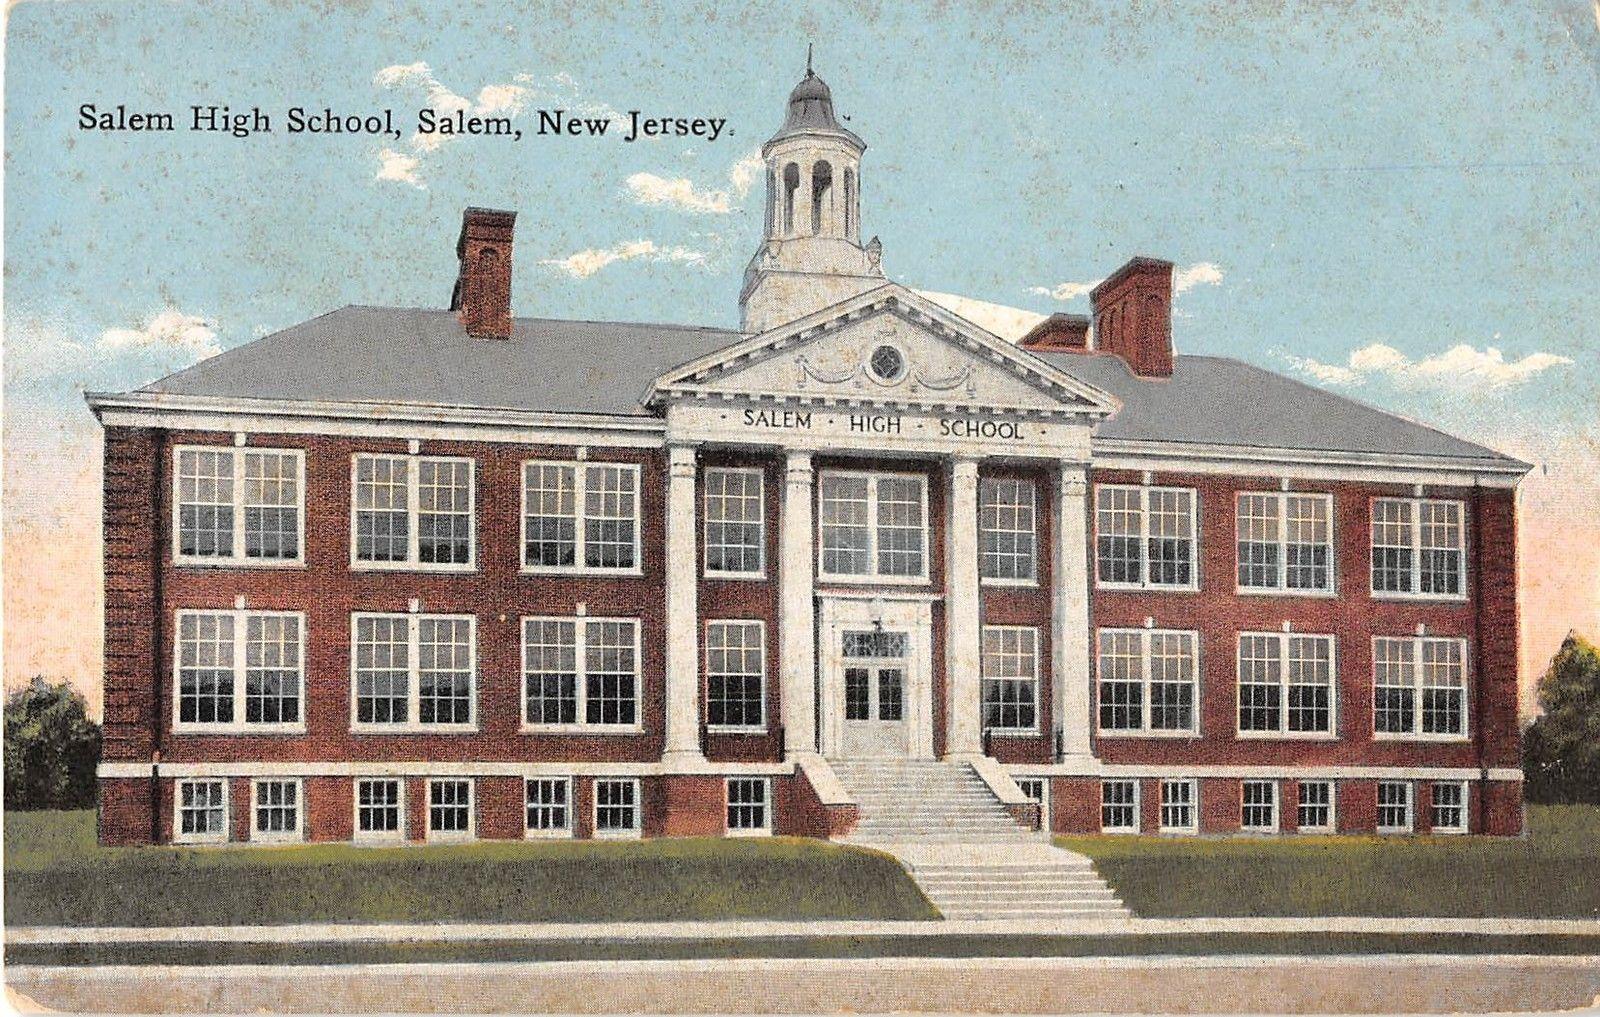 Salem New Jersey Salem High School Exterior Front View